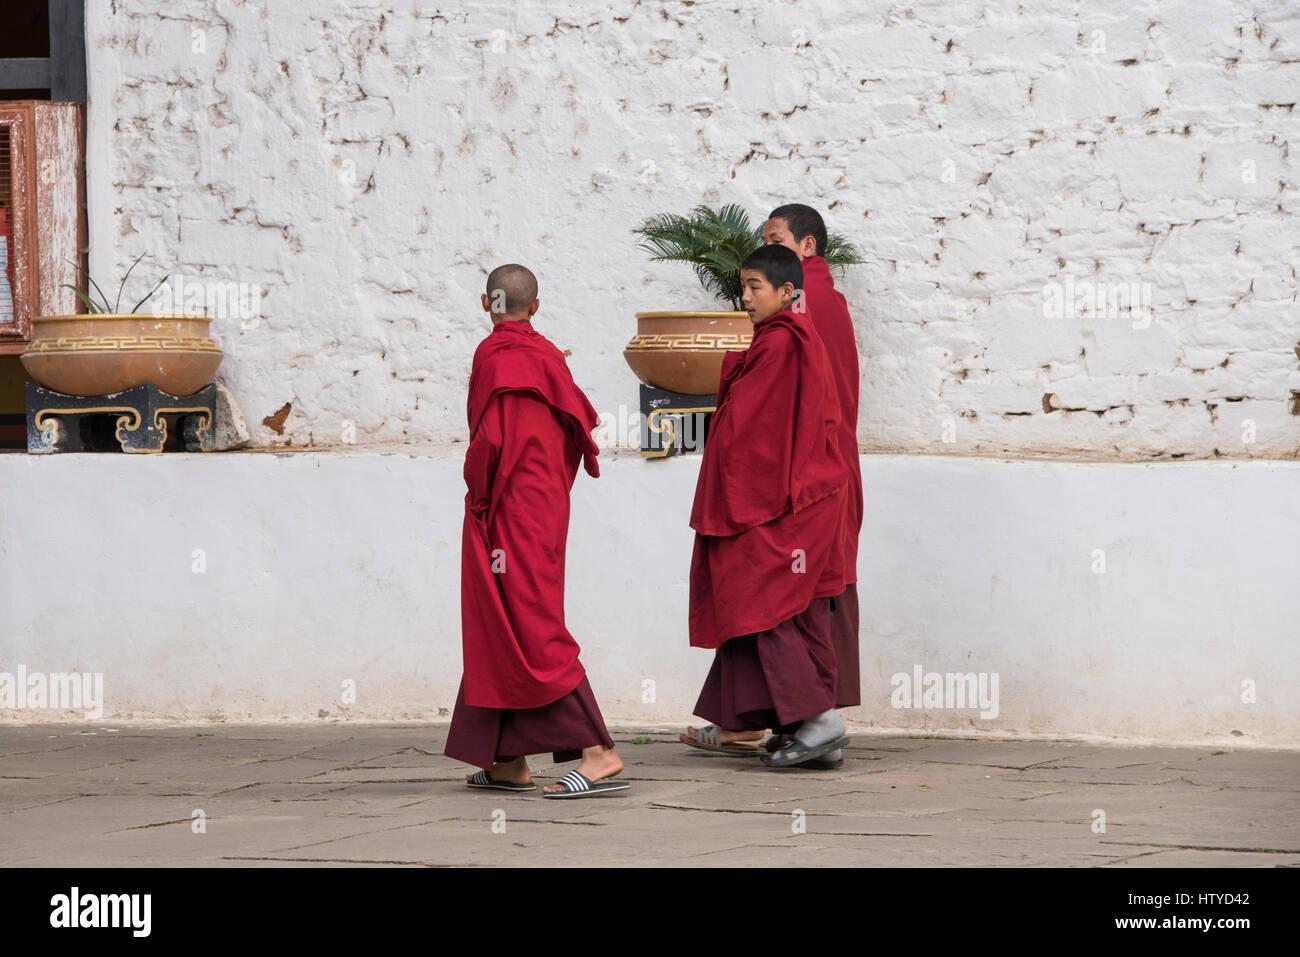 Bhutan, Paro, Rinpung Dzong. Novice monks at 15th century Buddhist monastery and fortress. Tentative List for UNESCO Stock Photo